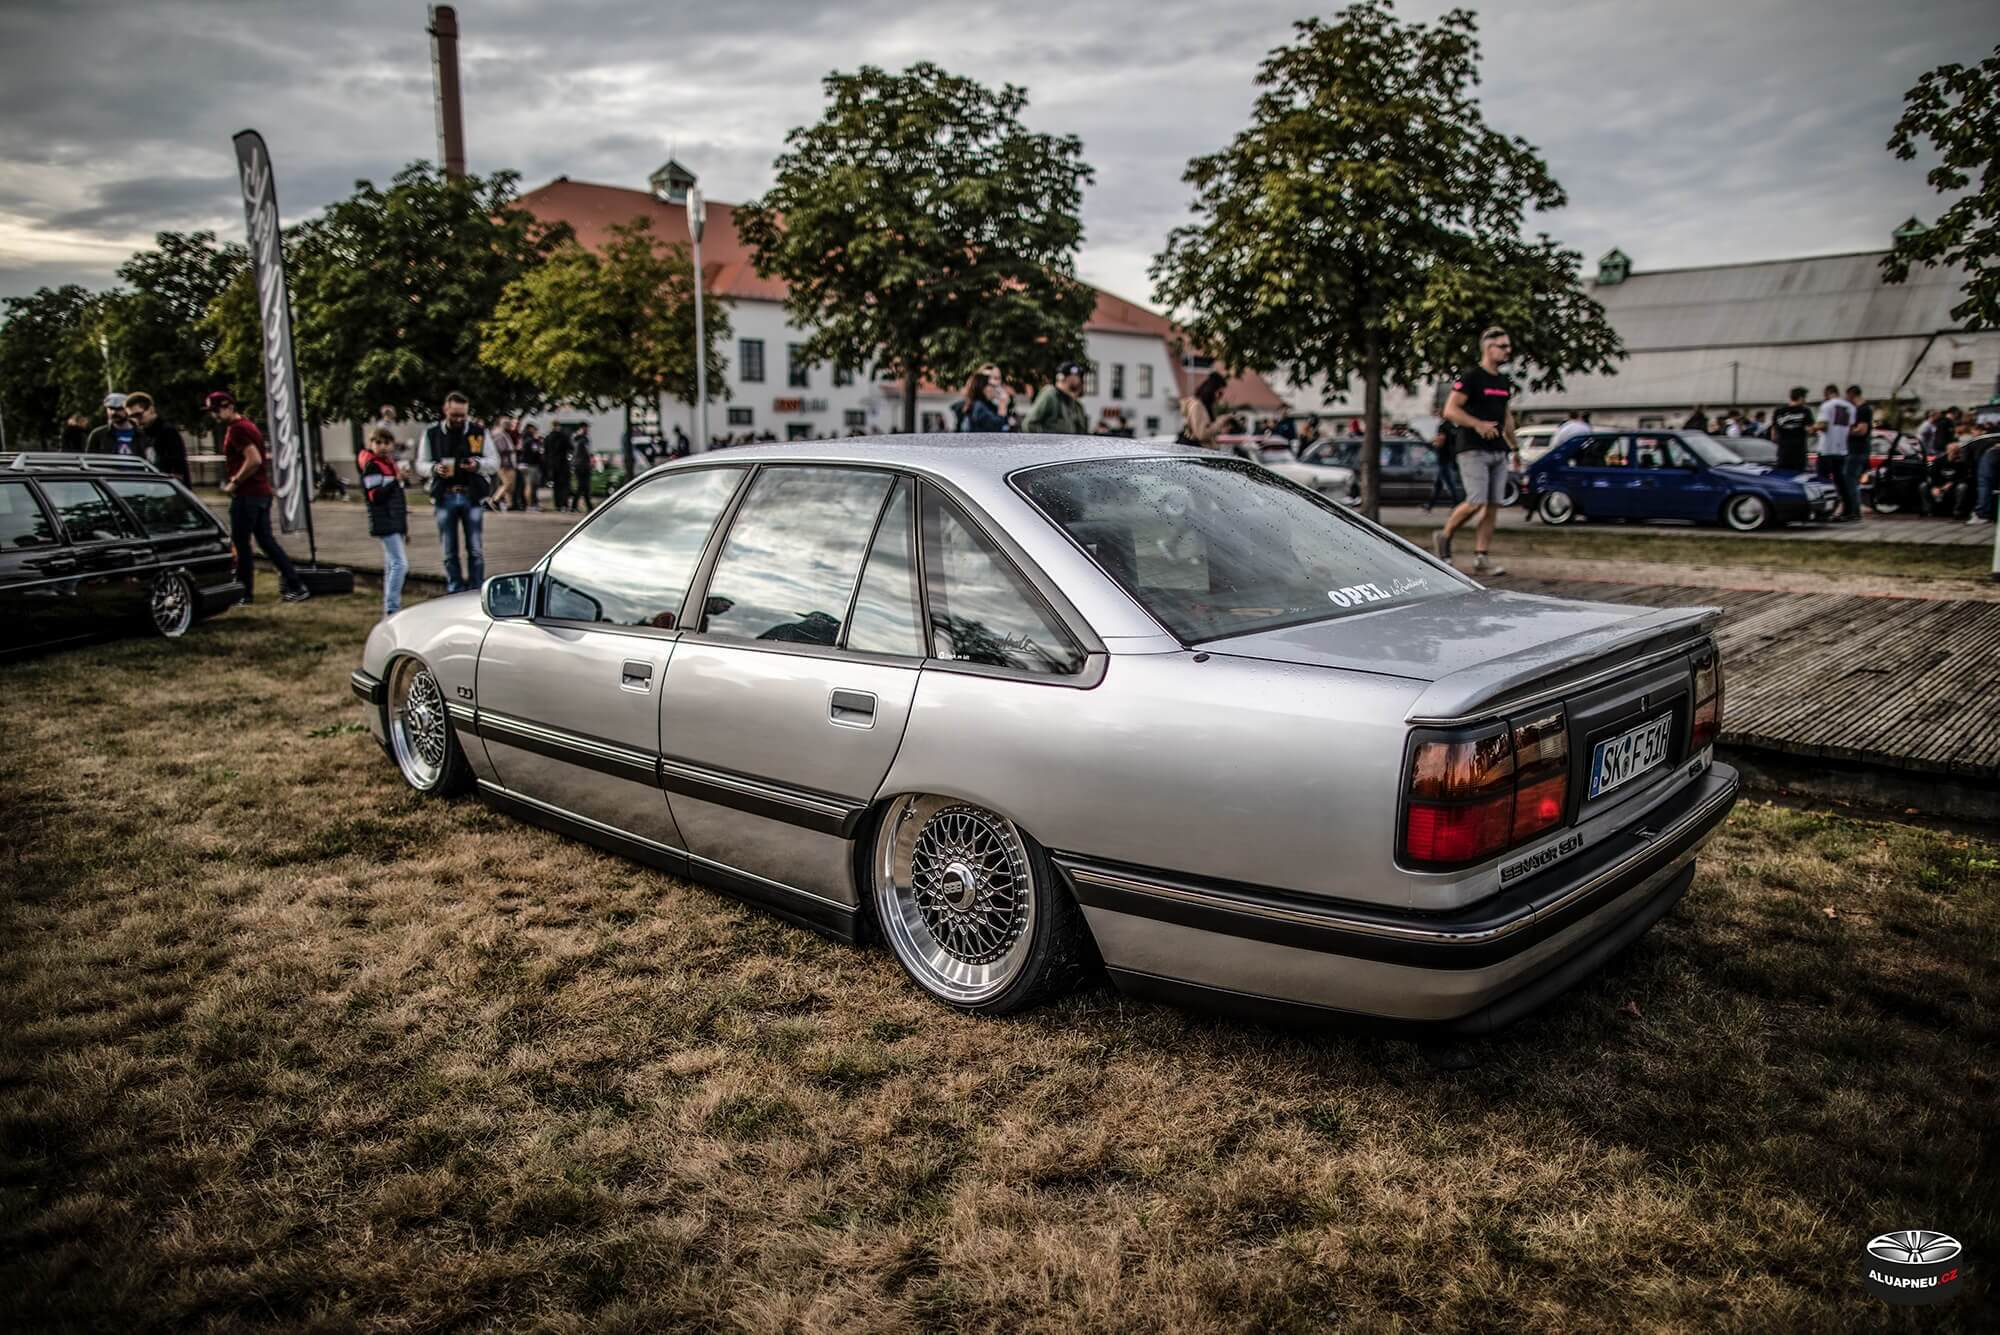 Alu kola Opel Omega - XS Classic Carnight 5.0 - Drážďany tuning sraz 2019 - www.aluapneu.cz